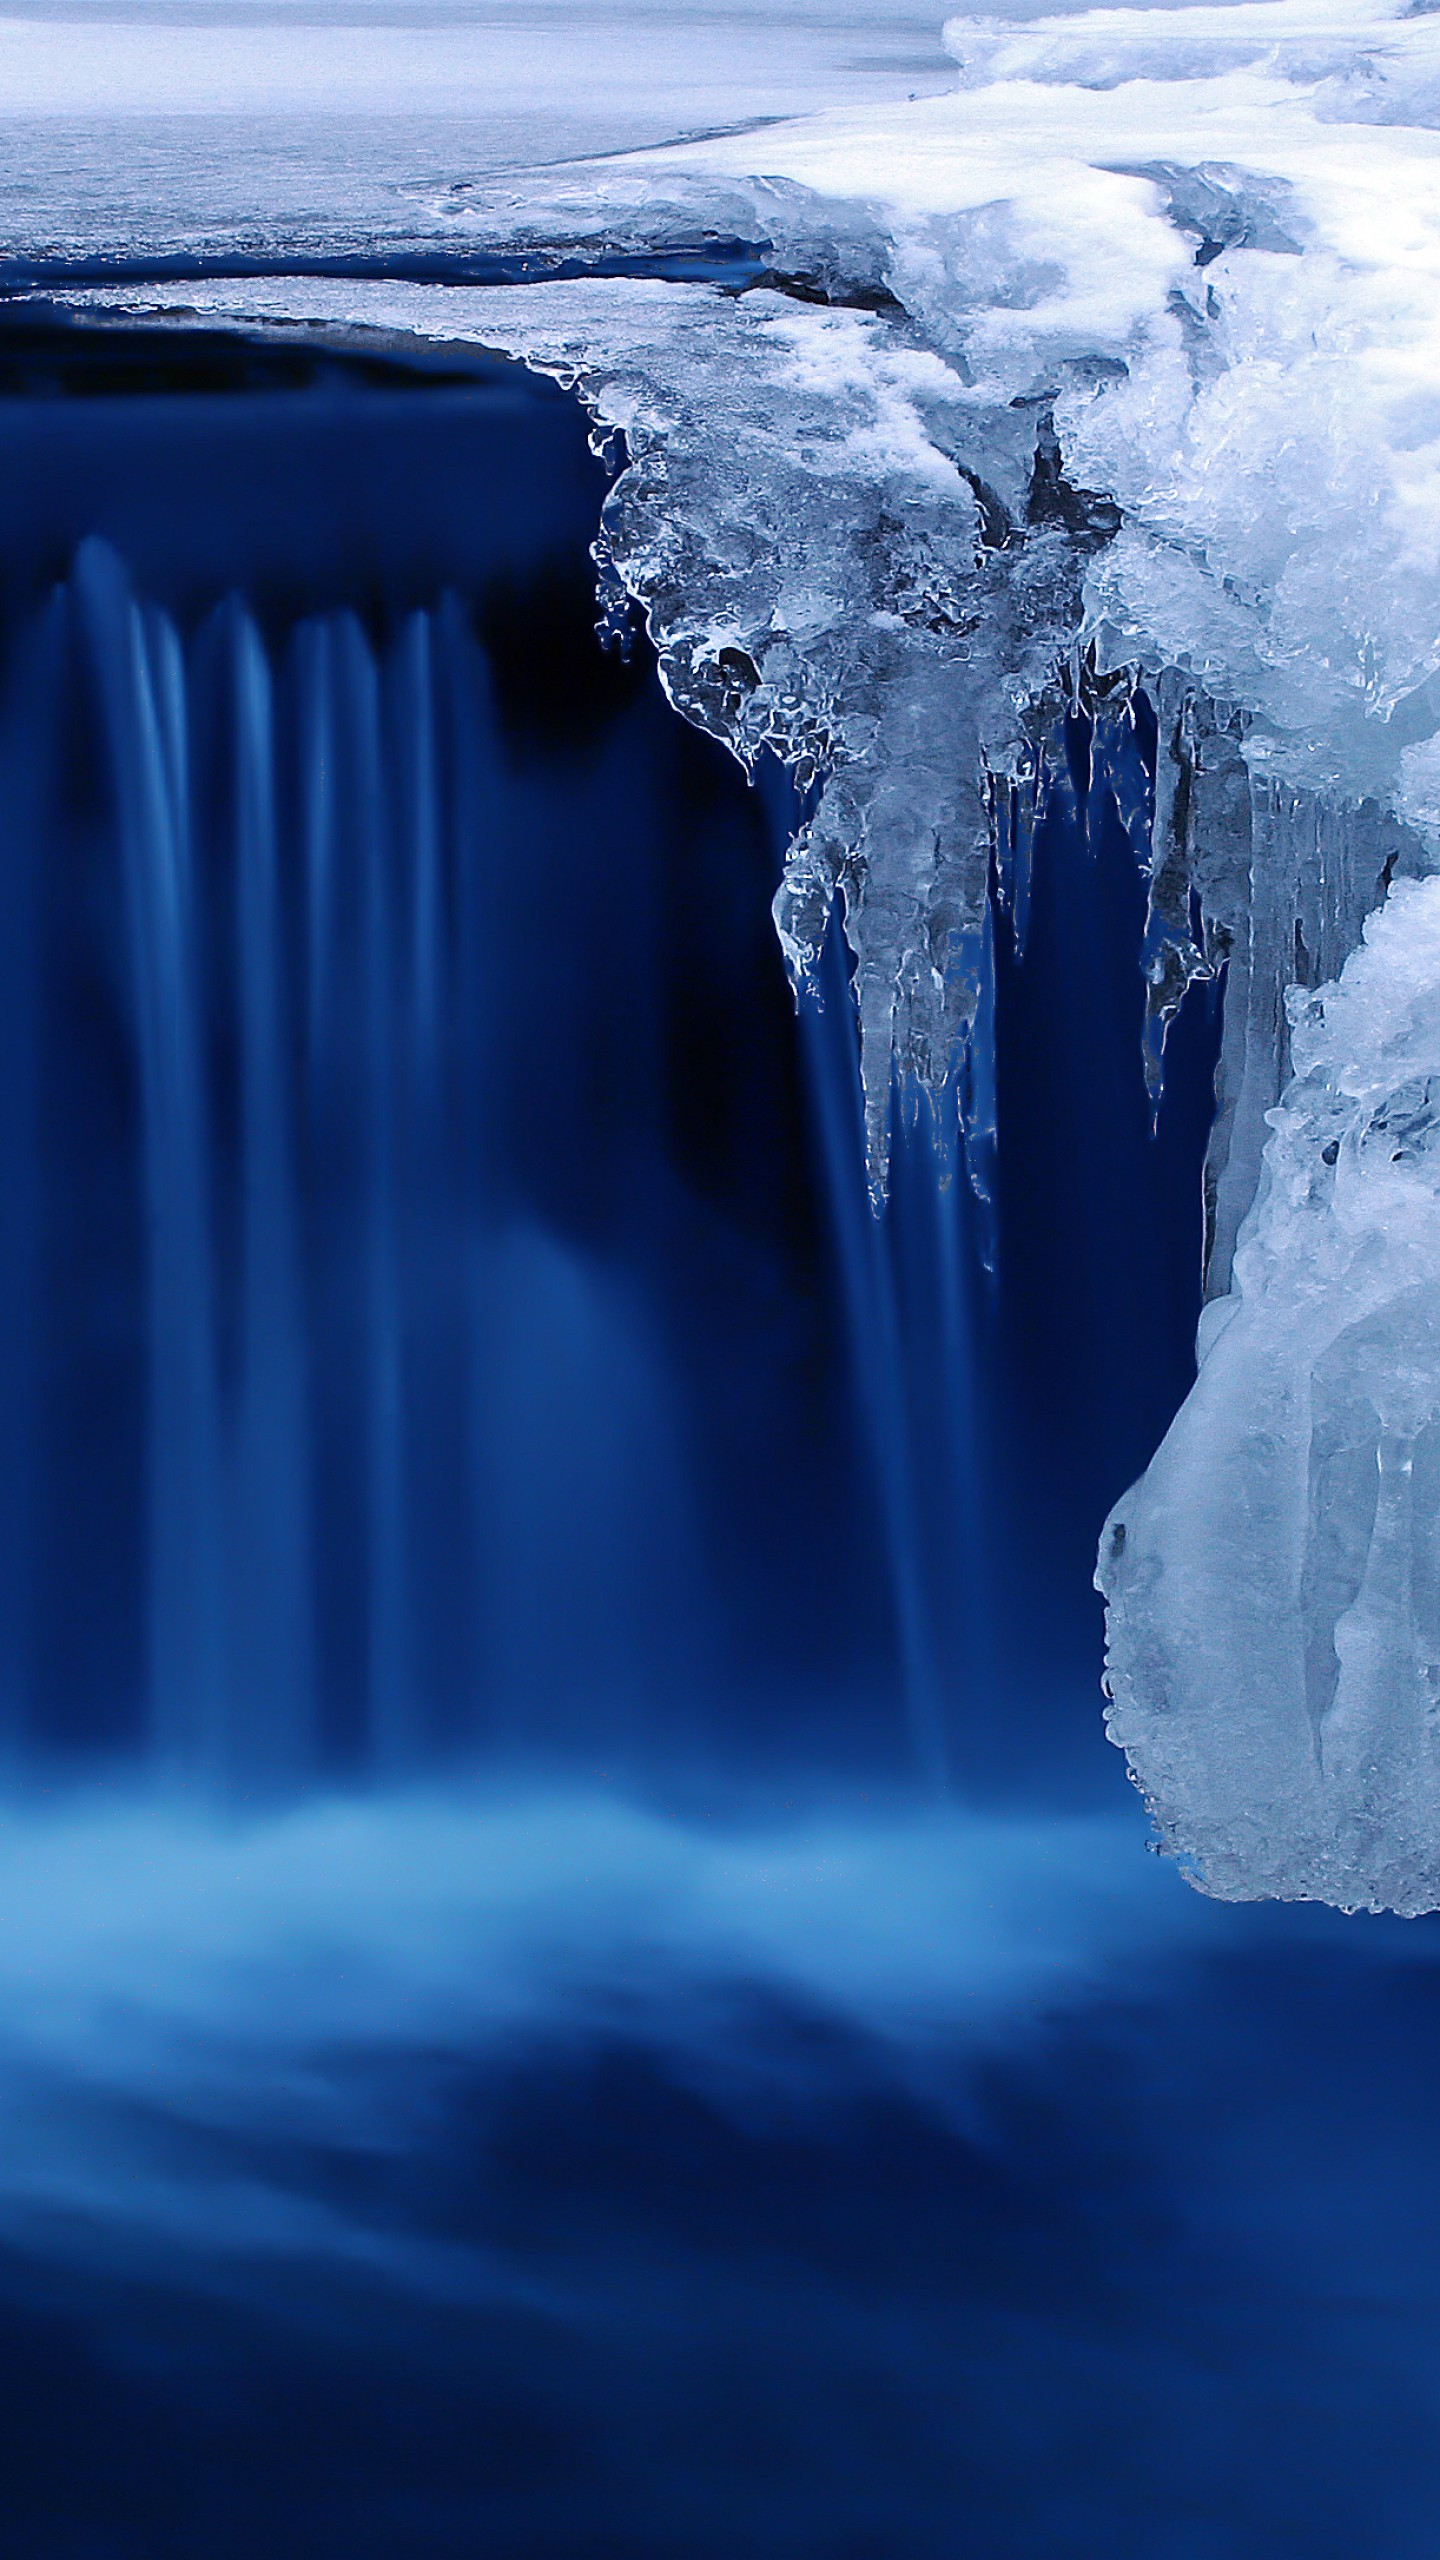 Wallpaper Lake, 4k, HD Wallpaper, Waterfall, Water, Snow